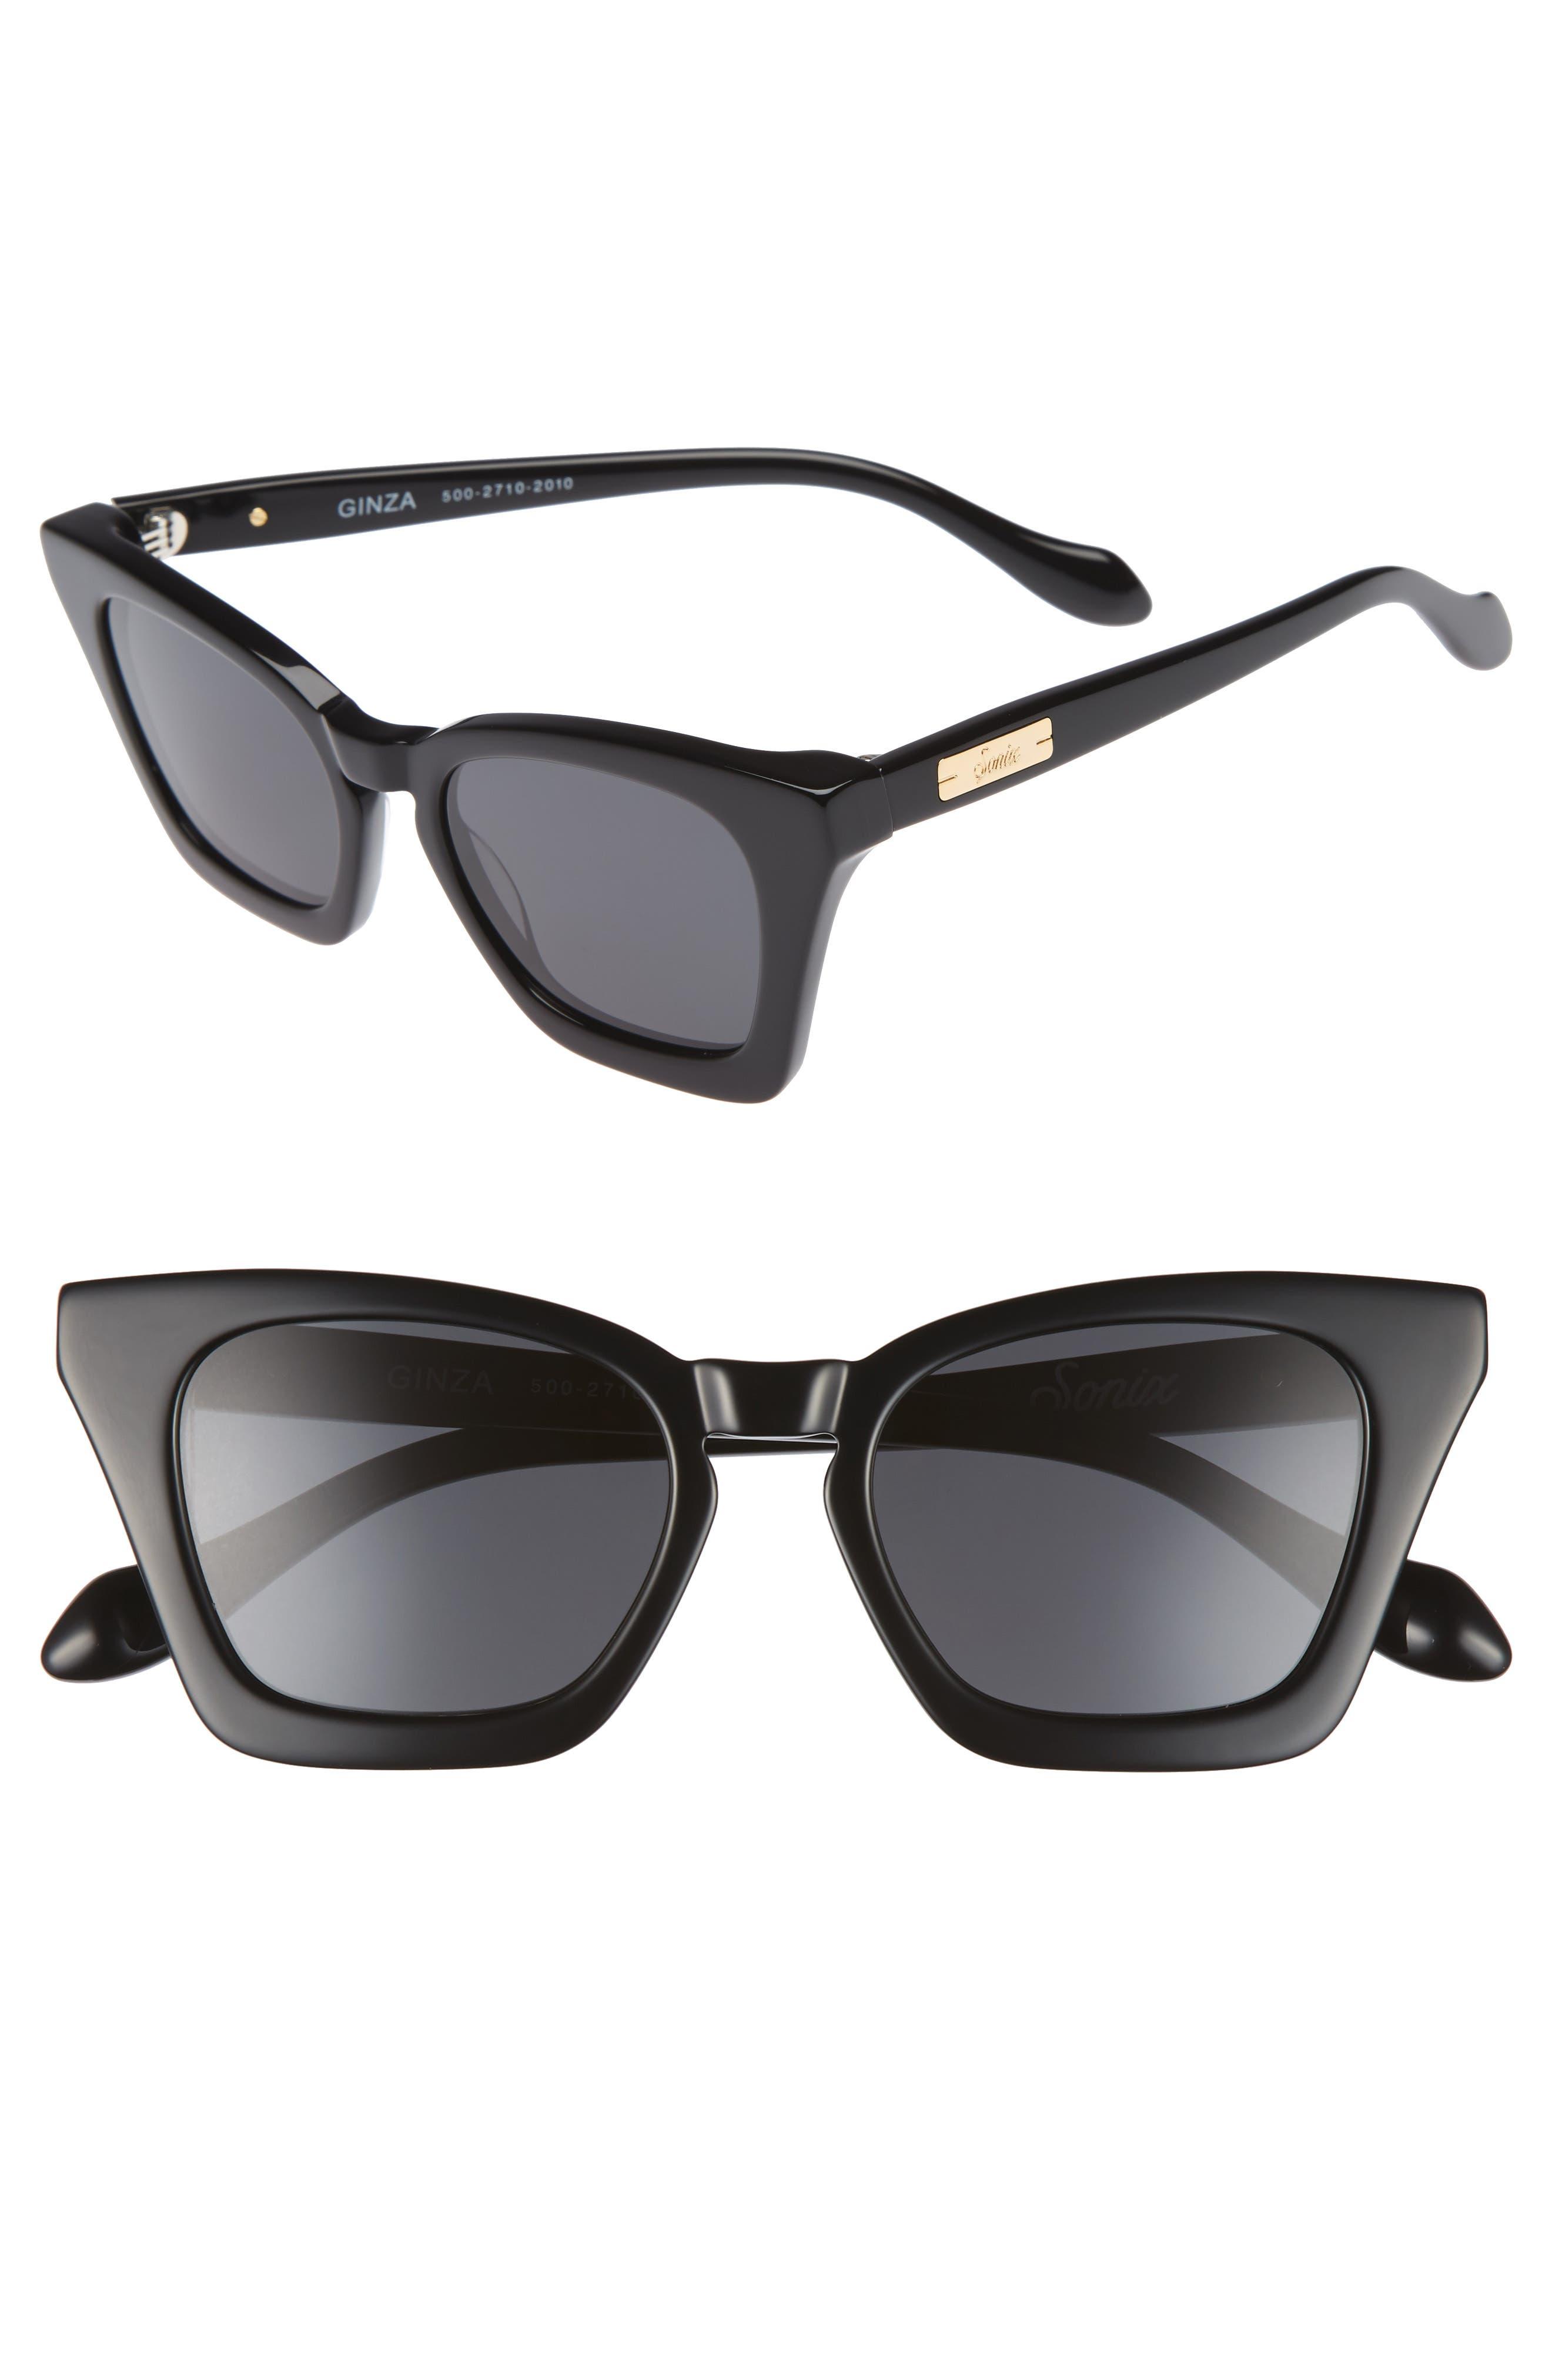 Ginza 50mm Cat Eye Sunglasses,                             Main thumbnail 1, color,                             001